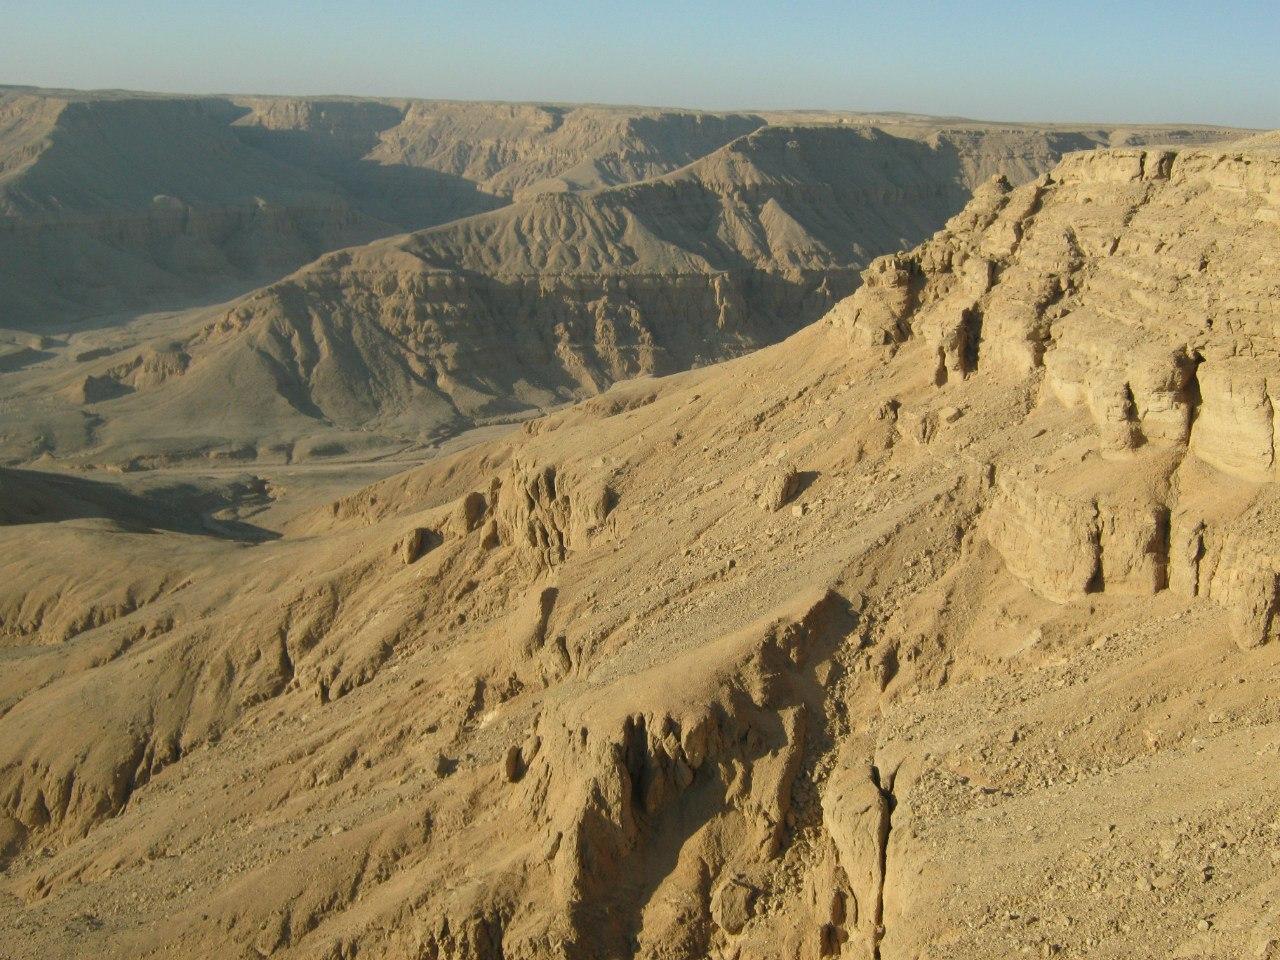 пейзажи по ту сторону хребта на западном берегу Луксора